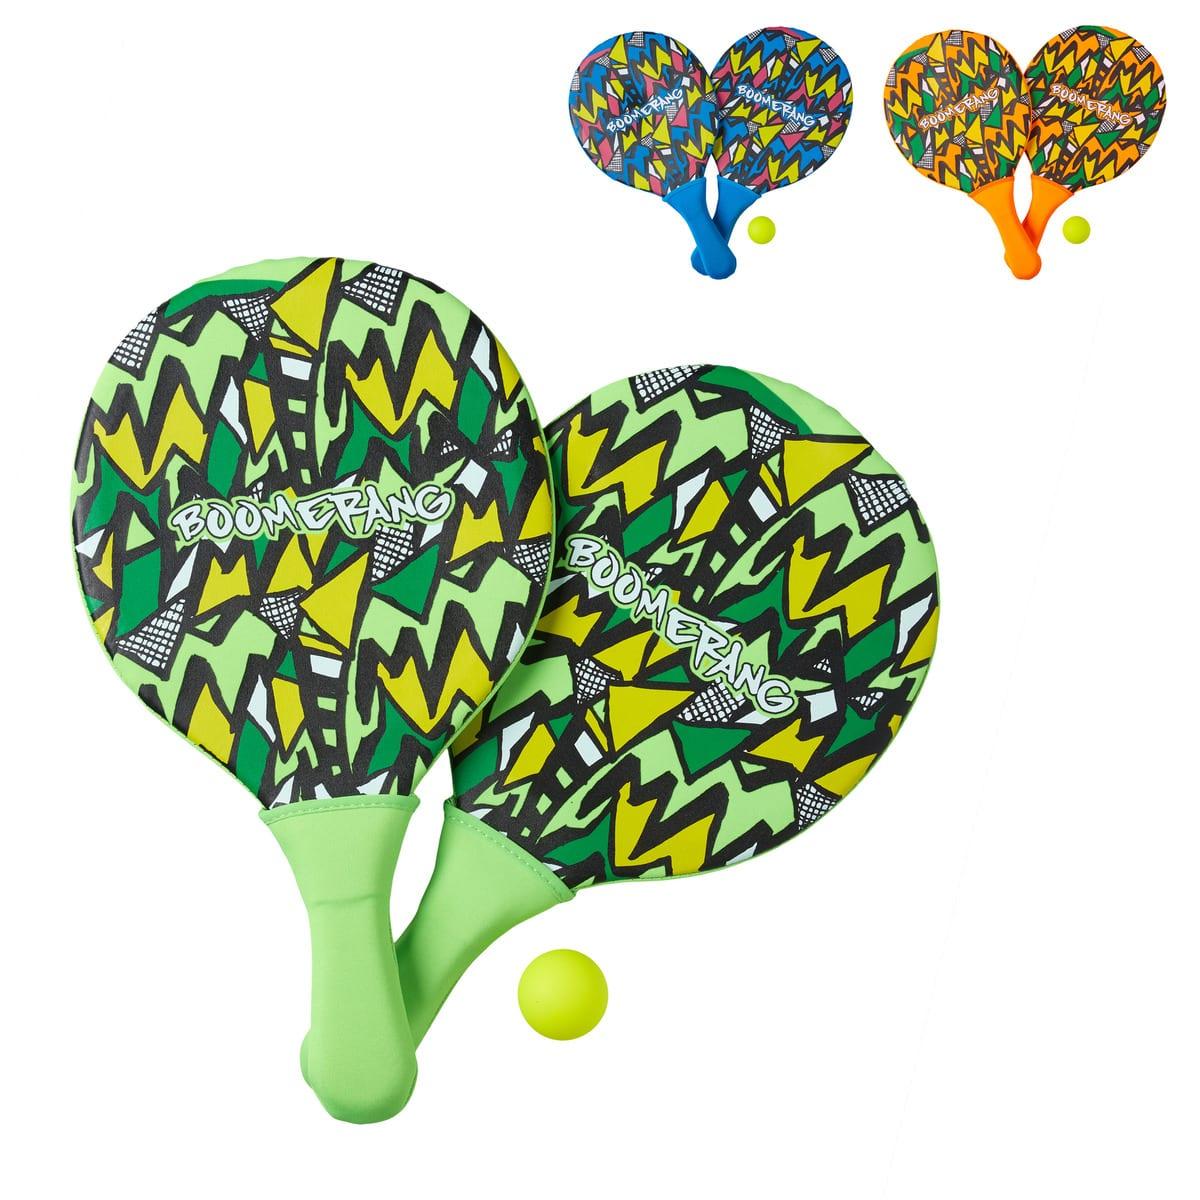 brinquedos de praia - raquetes praia boomerang